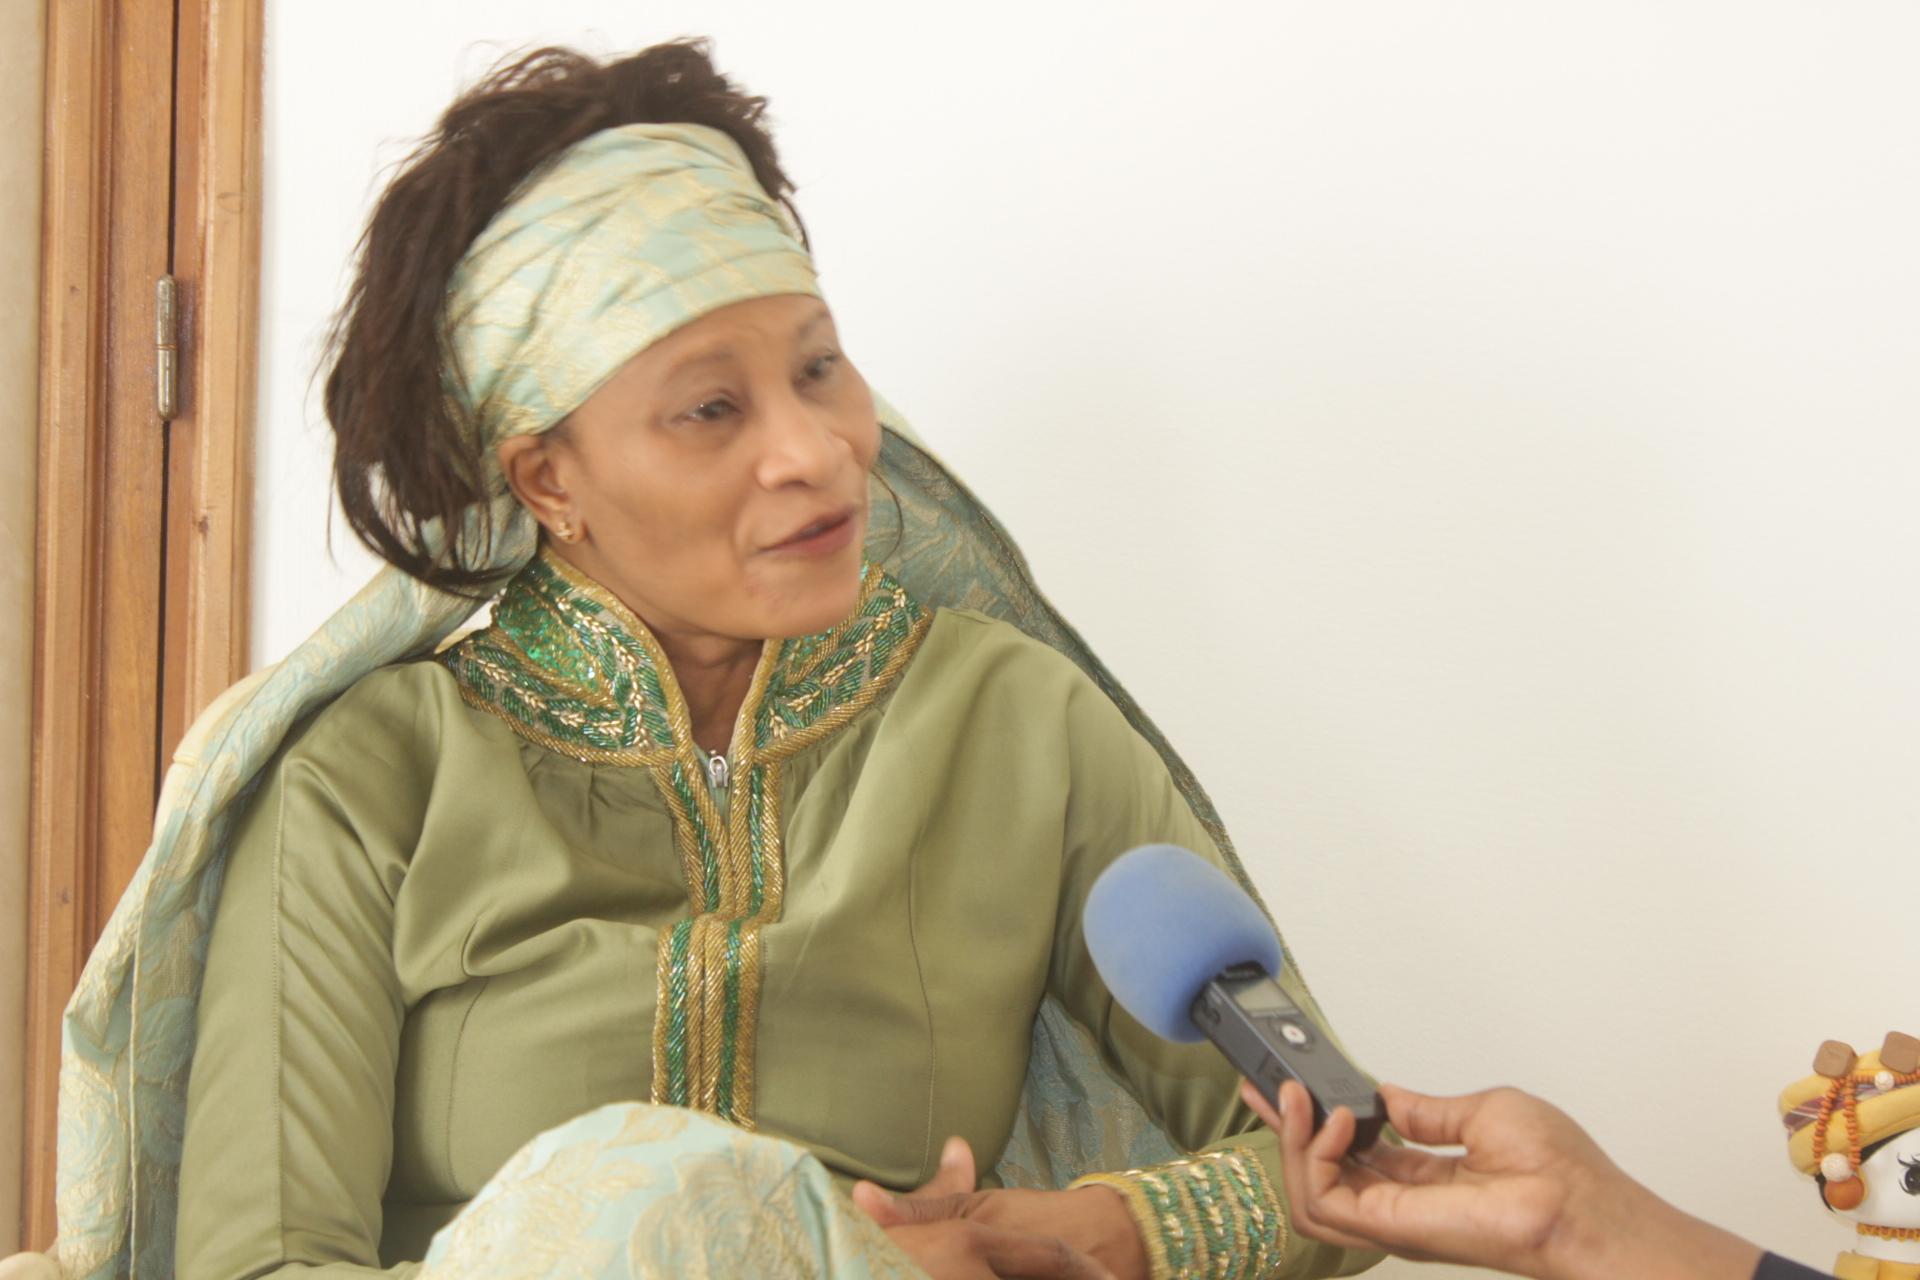 Me Aïssata Tall Sall plaide la libération de Oumar Sarr